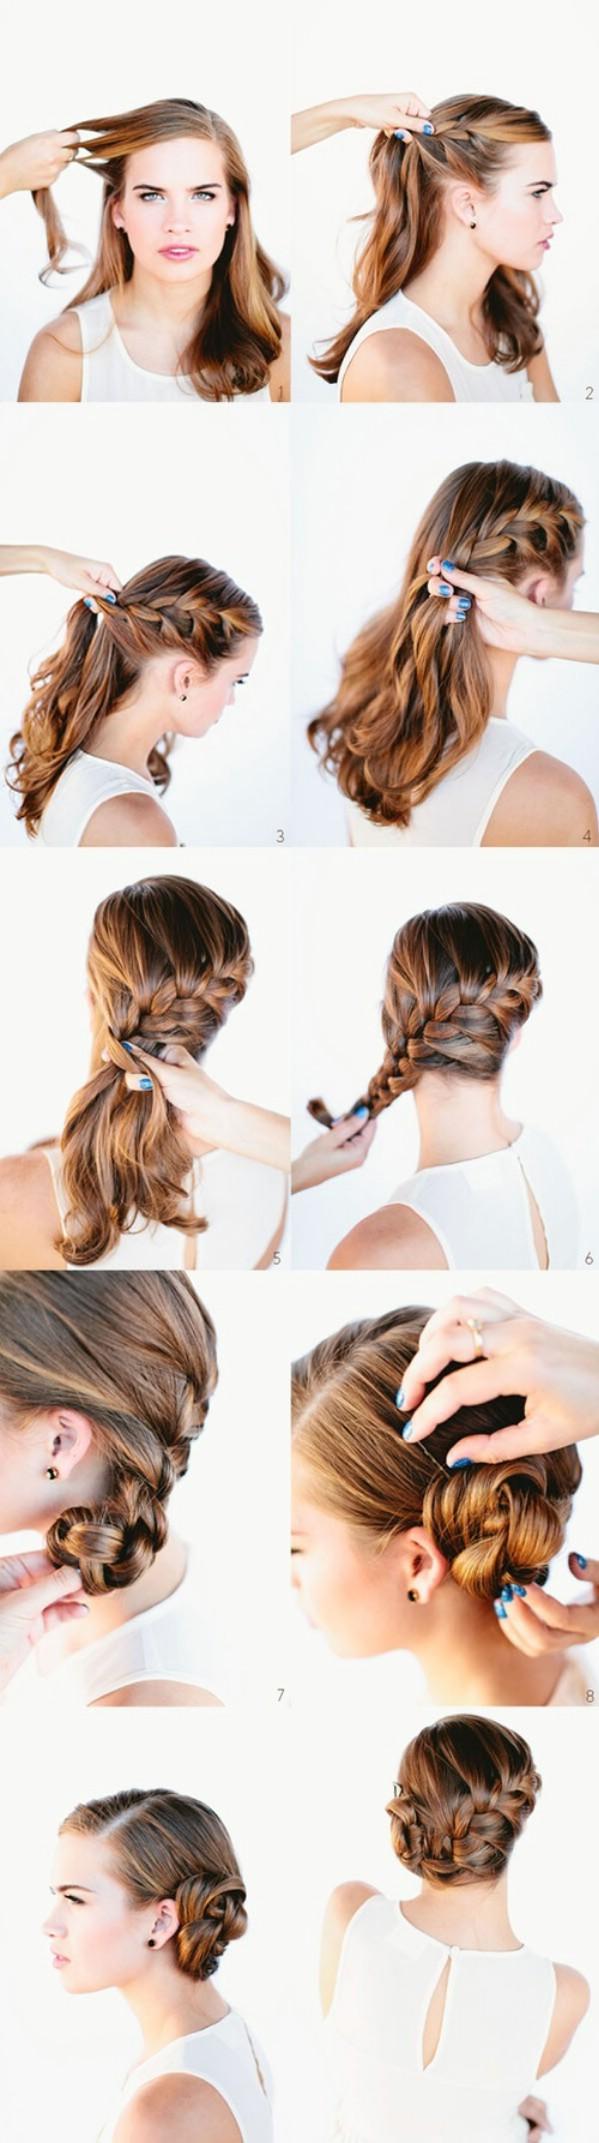 Wondrous Stunning Diy Hairstyle Side French Braid Into A Bun Women39S Short Hairstyles Gunalazisus